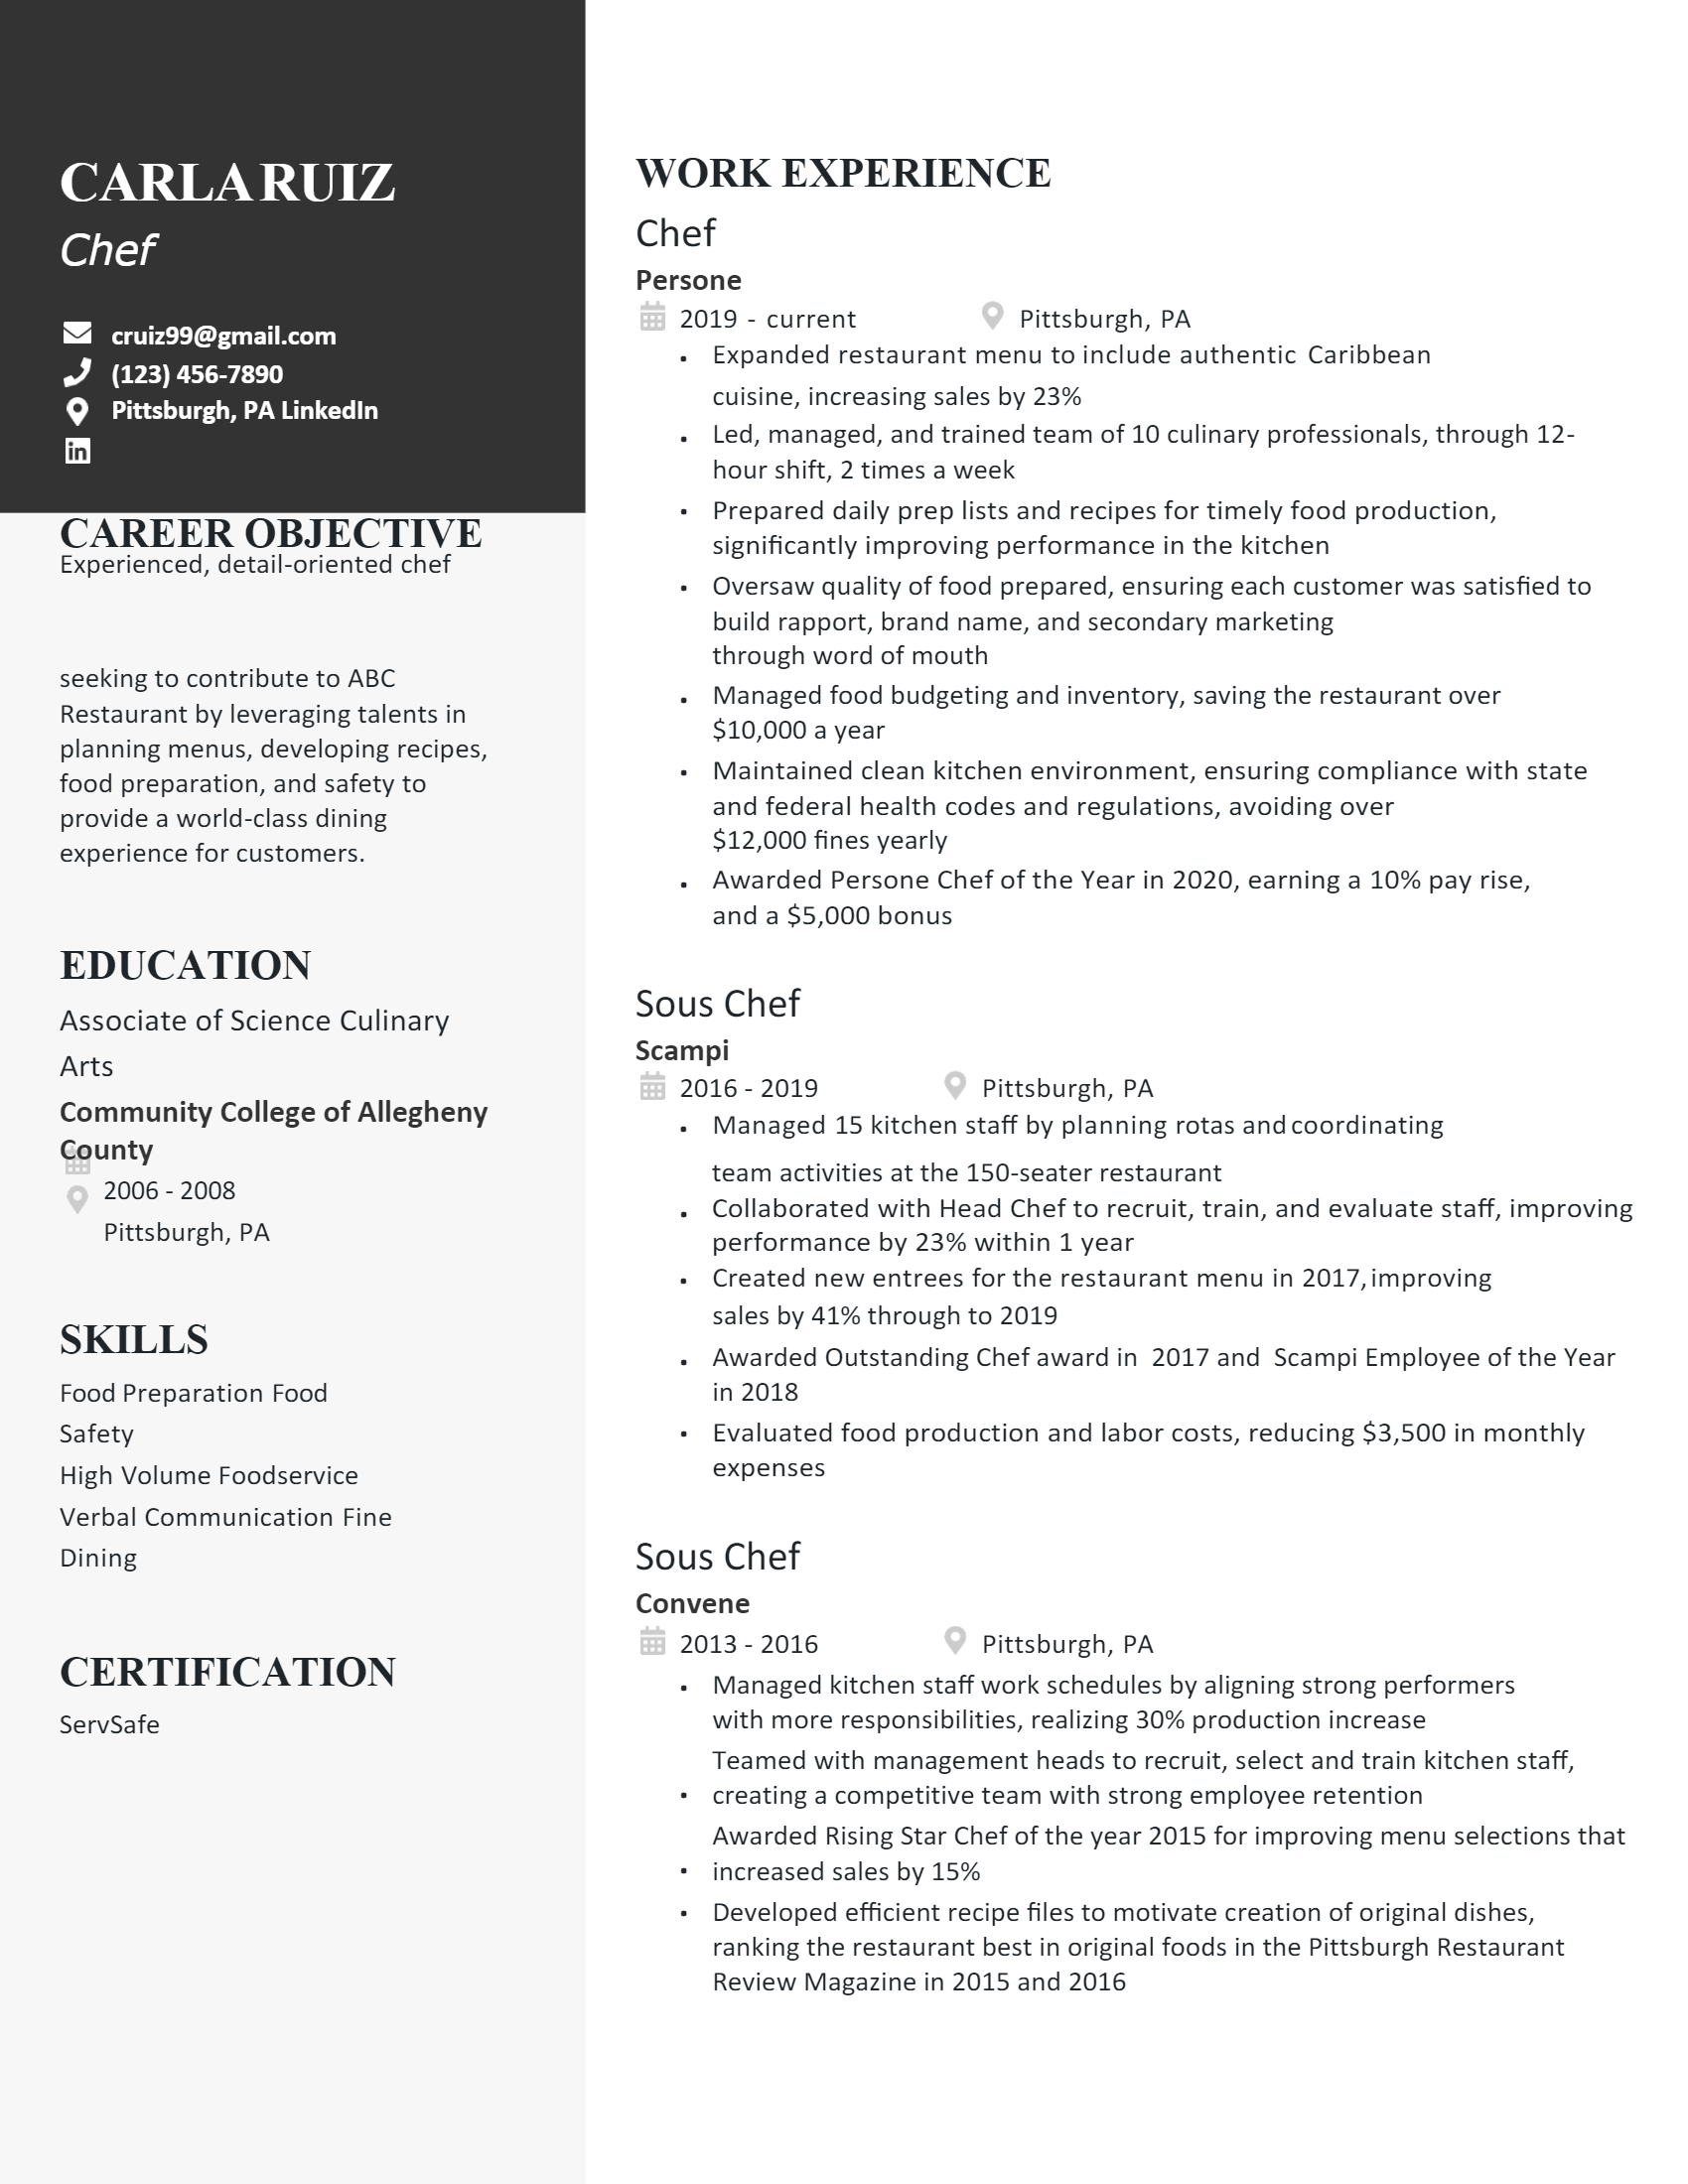 Chef Resume